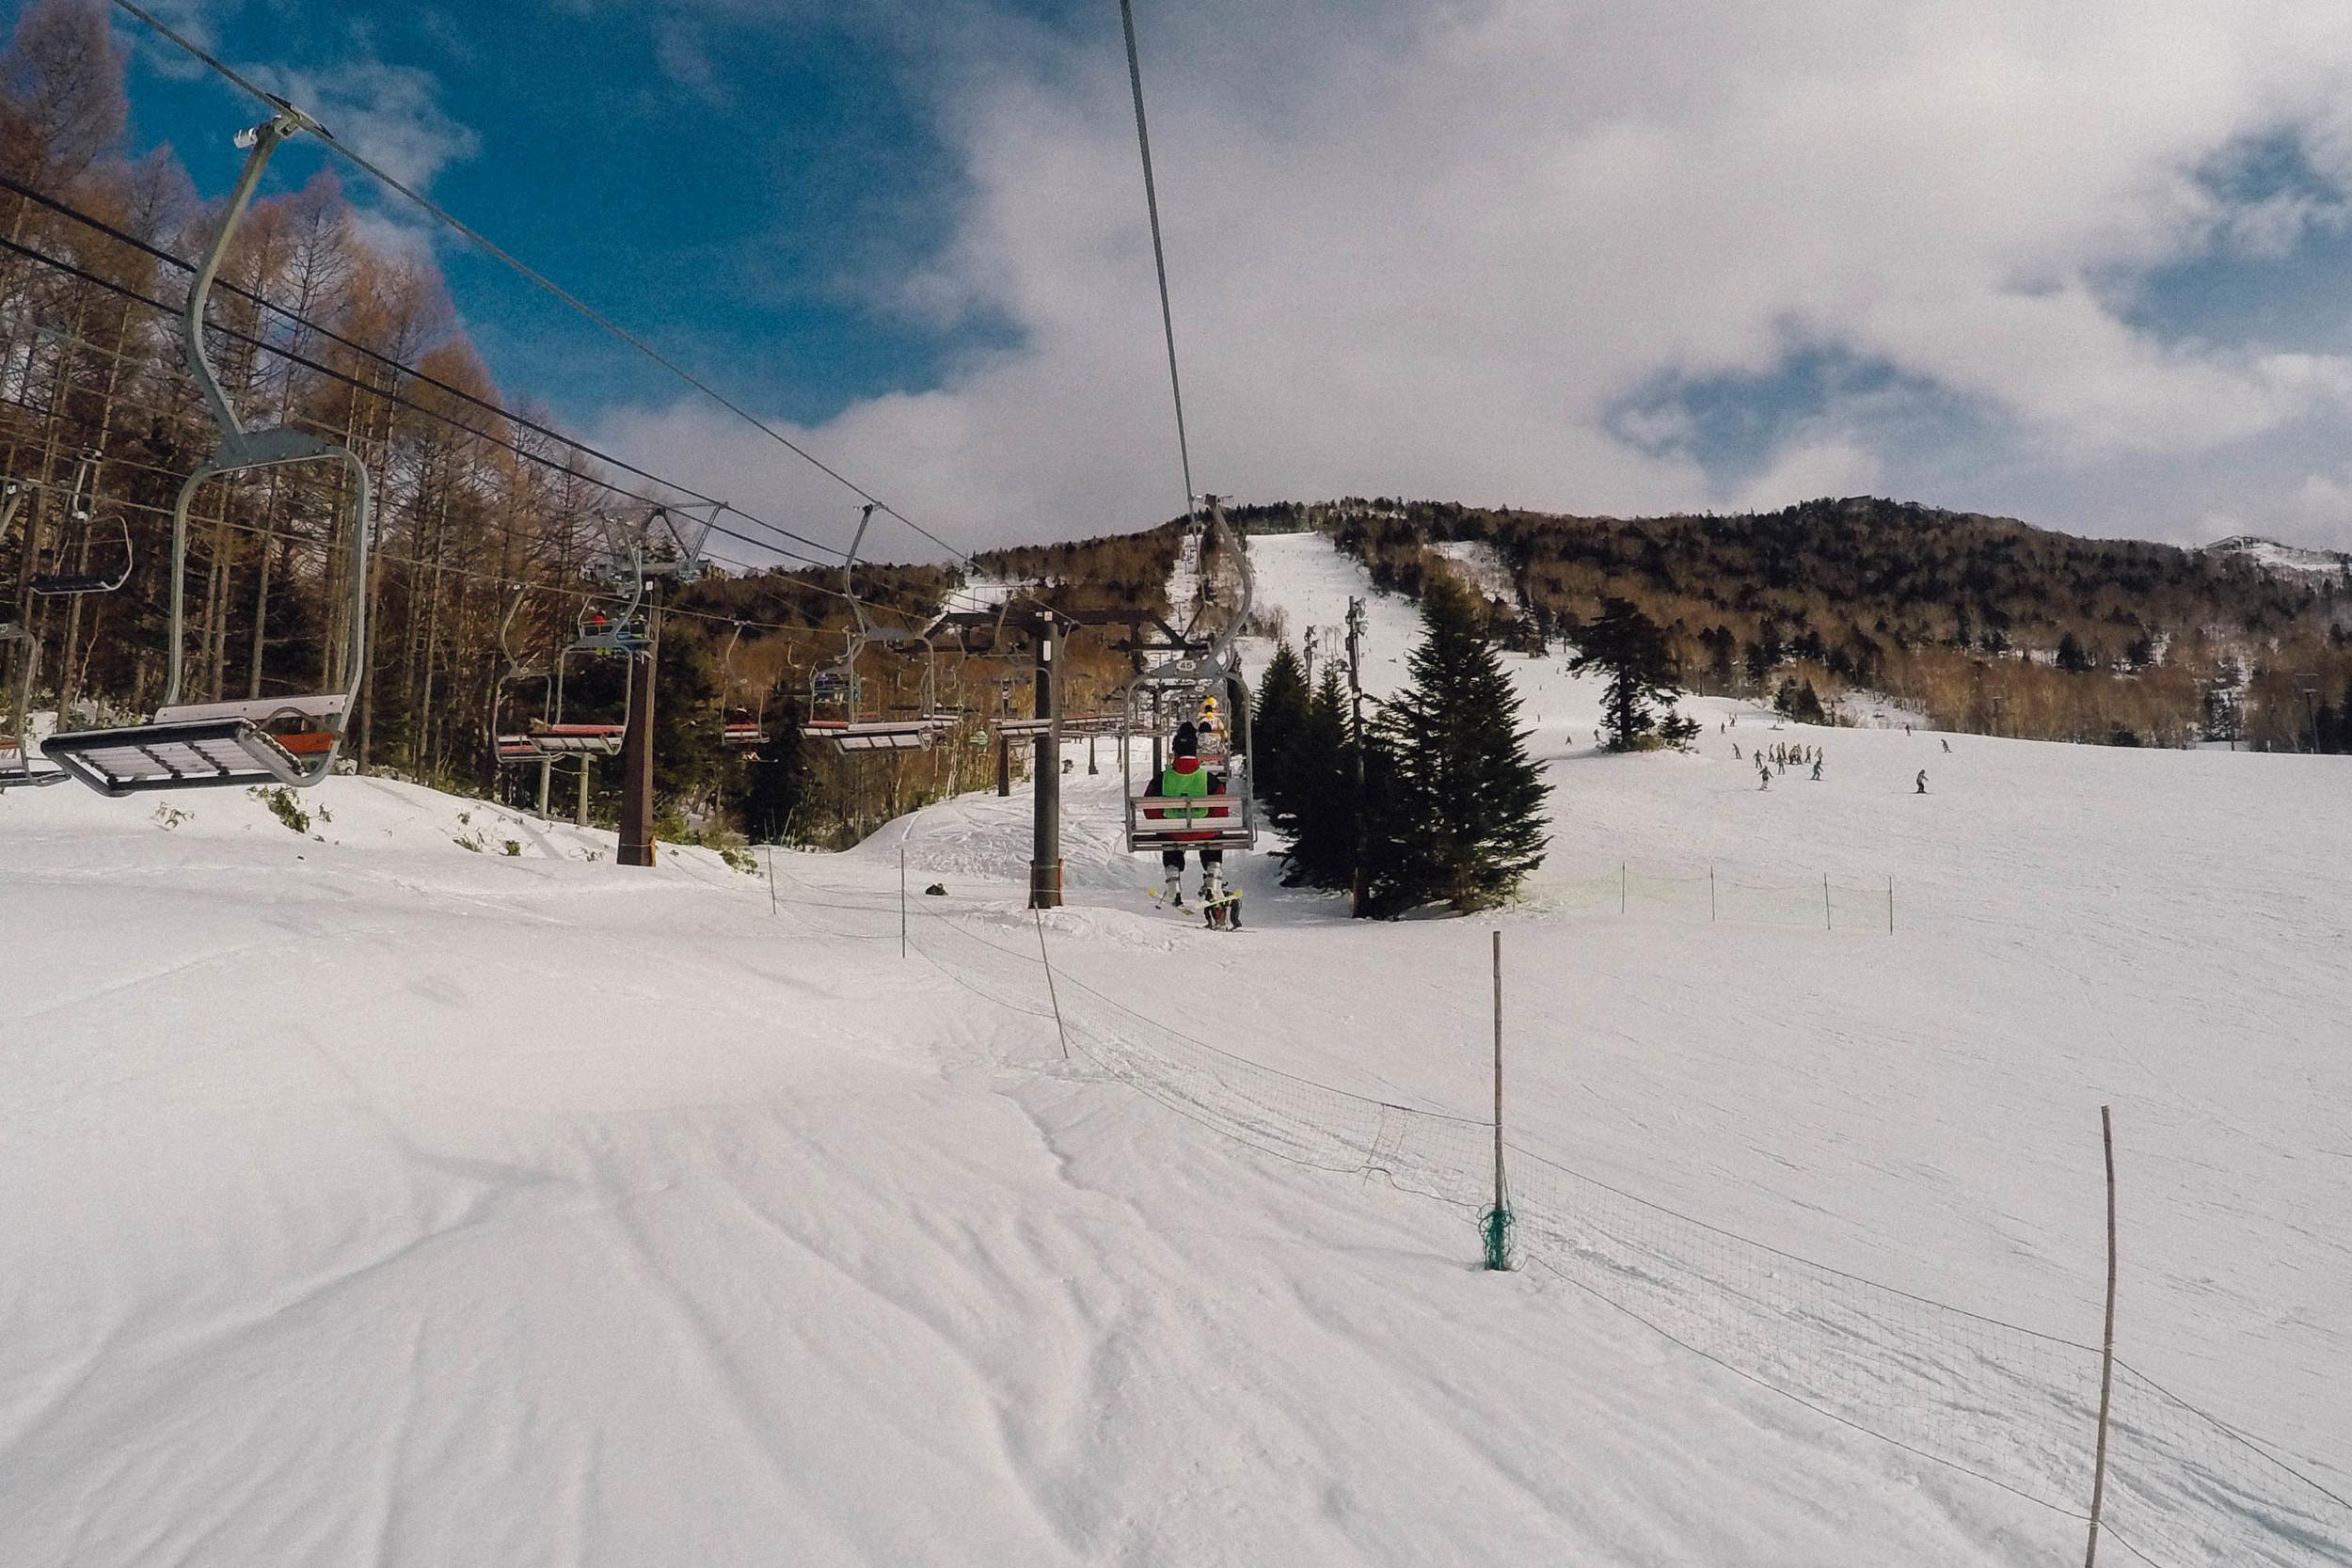 Ichinose Ski Area.